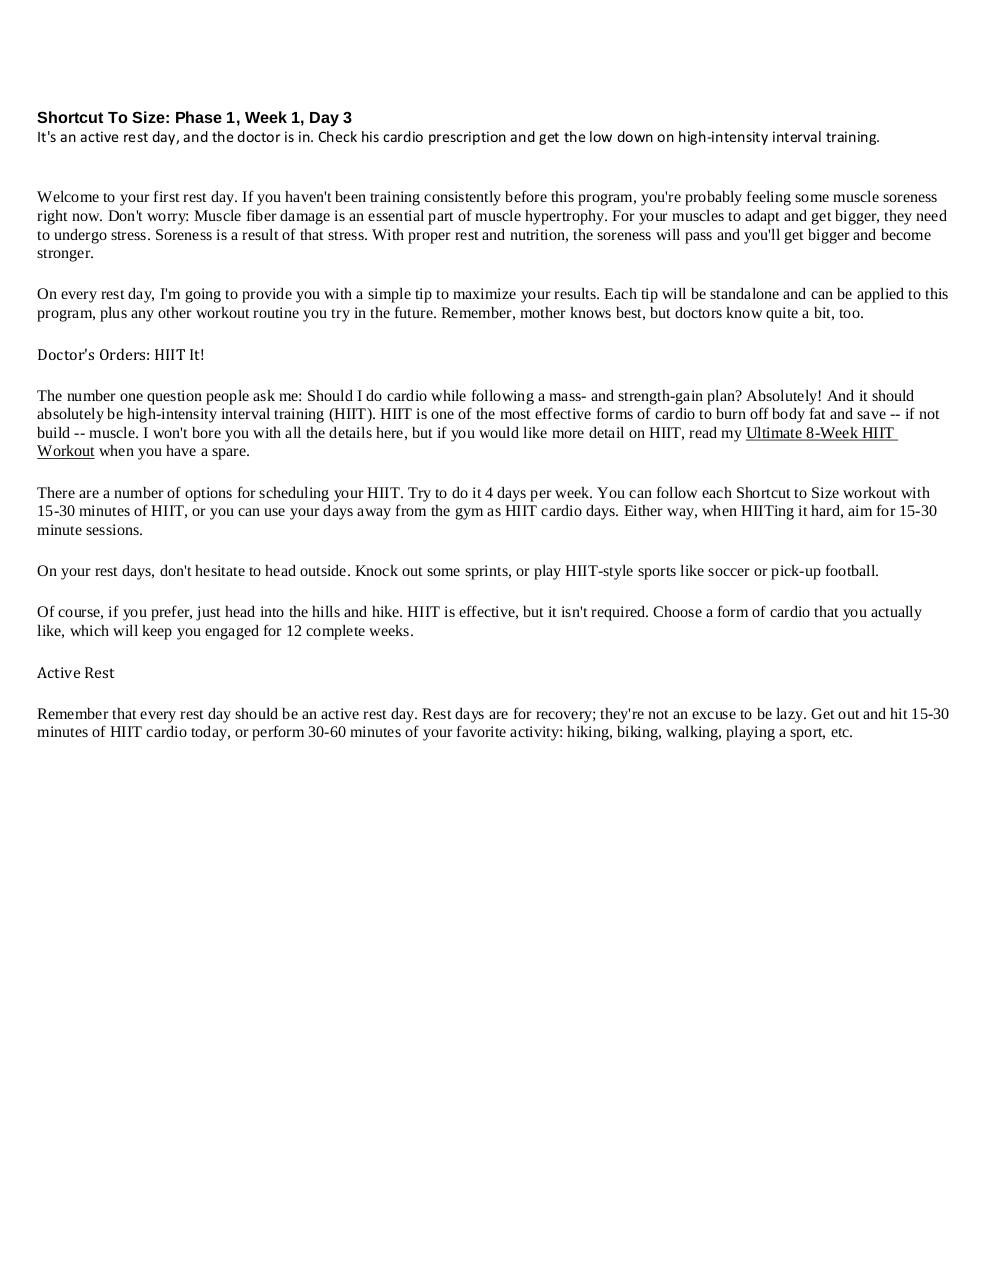 Jim Stoppani's Workout Log Bodybuilding com by FooGi